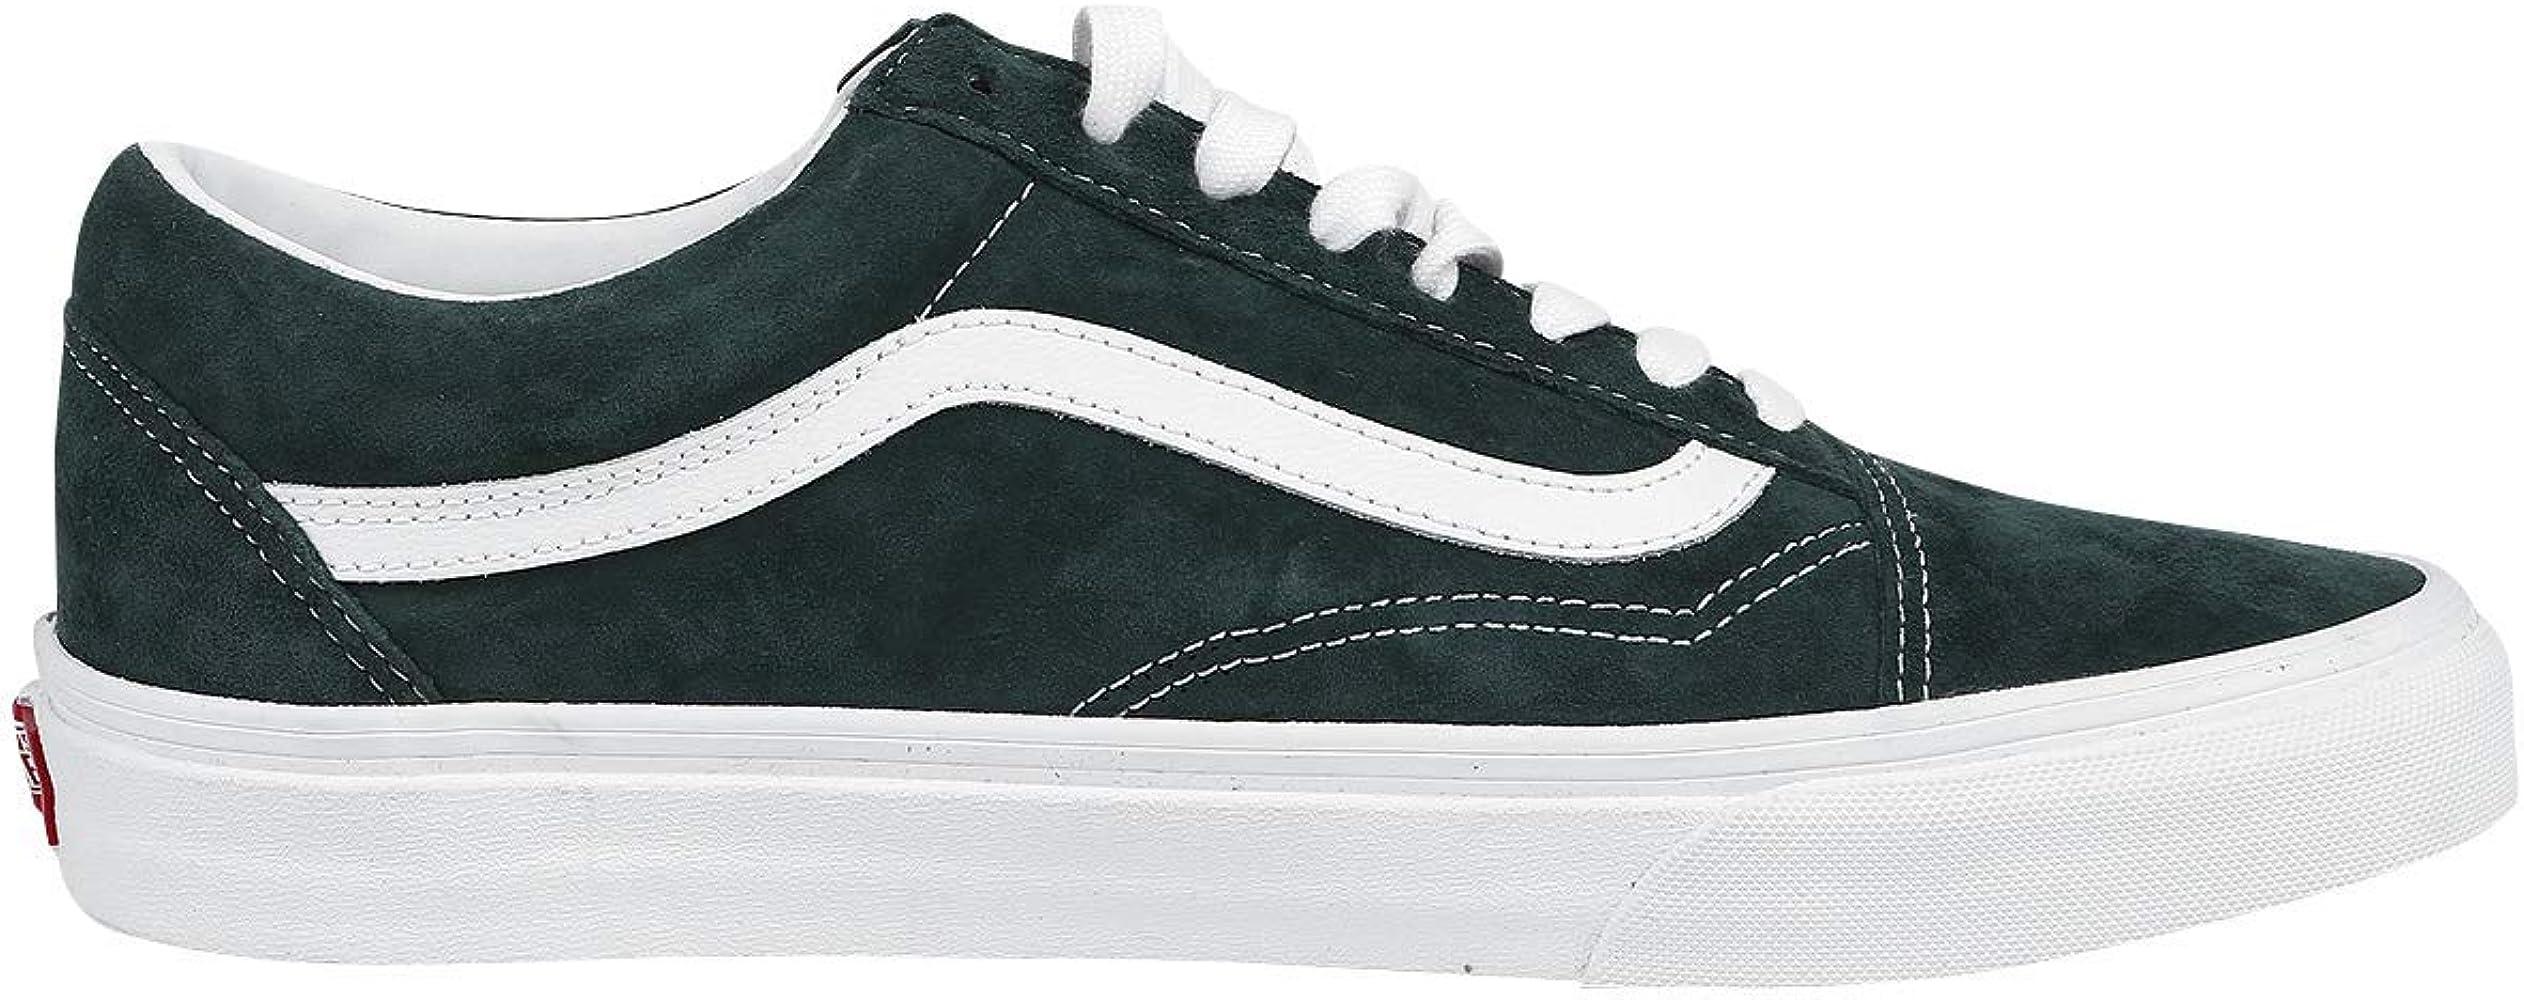 Vans Old Skool Sneaker dunkelgrün EU47: : Schuhe